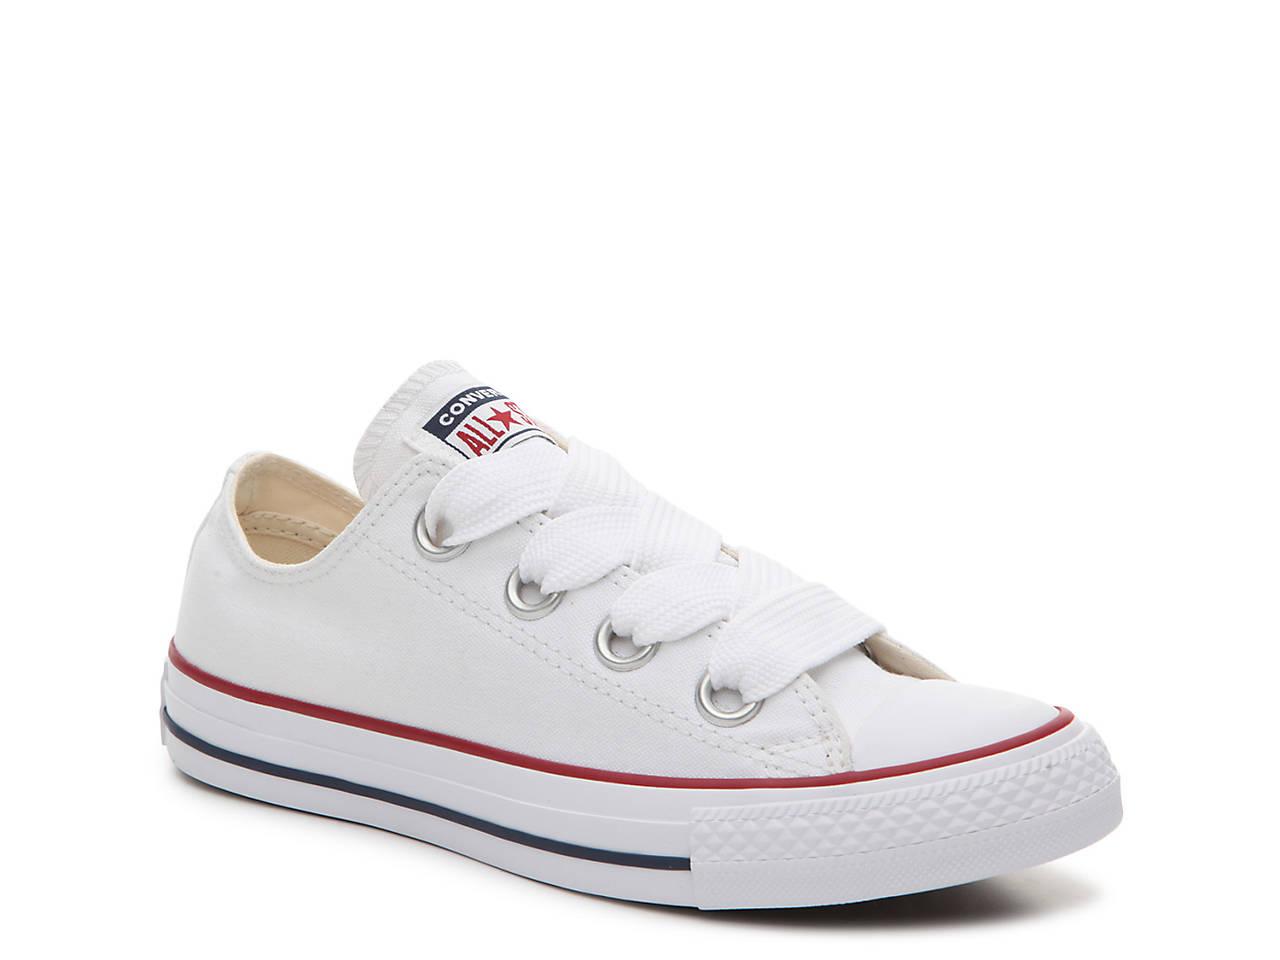 98d58cf965ce Converse Chuck Taylor All Star Big Eyelets Sneaker - Women s Women s ...